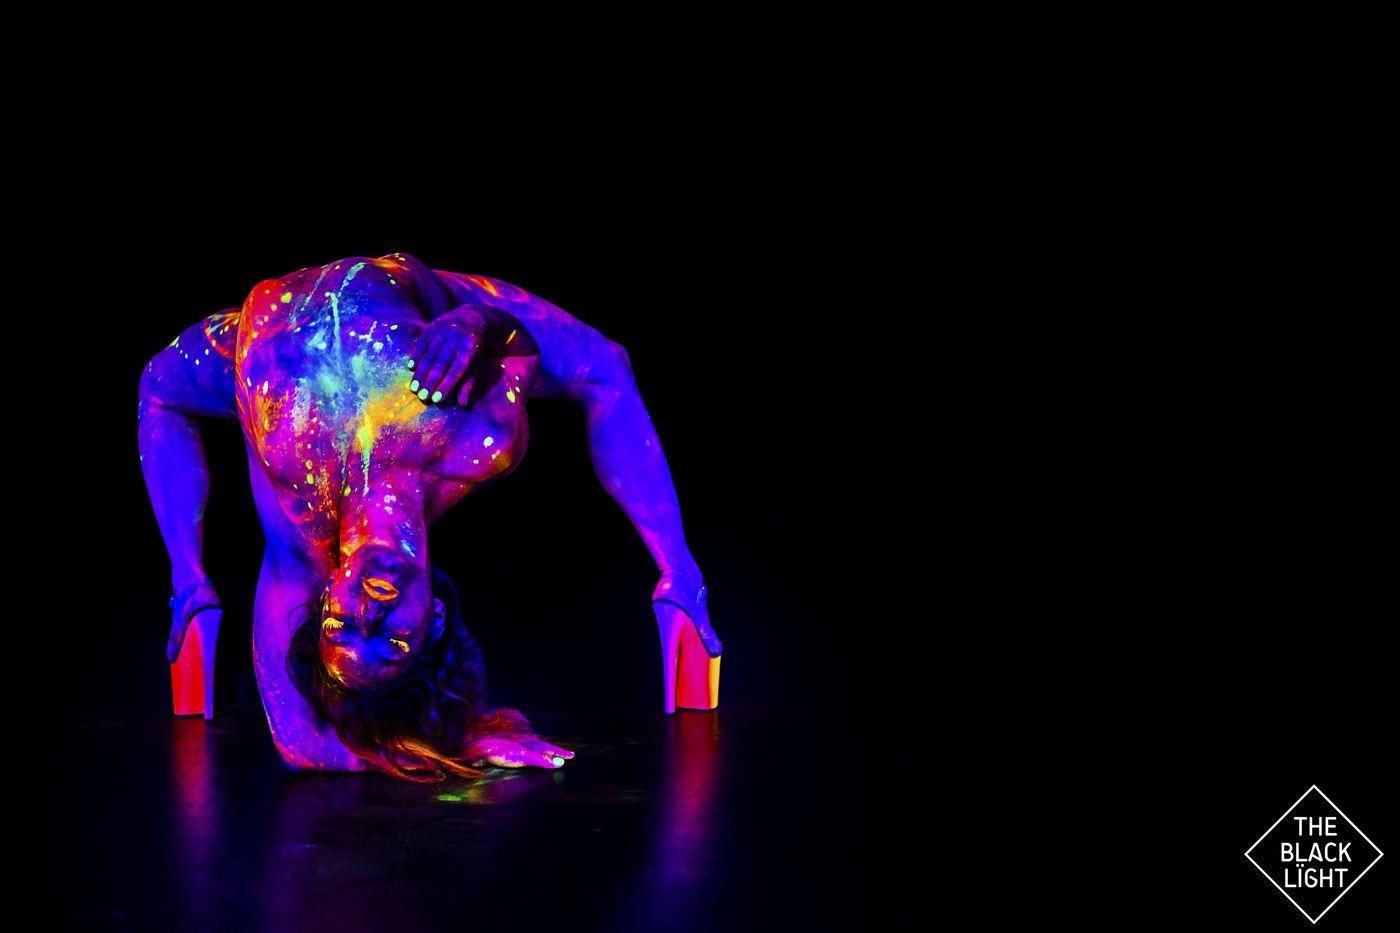 The Black Light - Magda Neon 3940 small.jpg